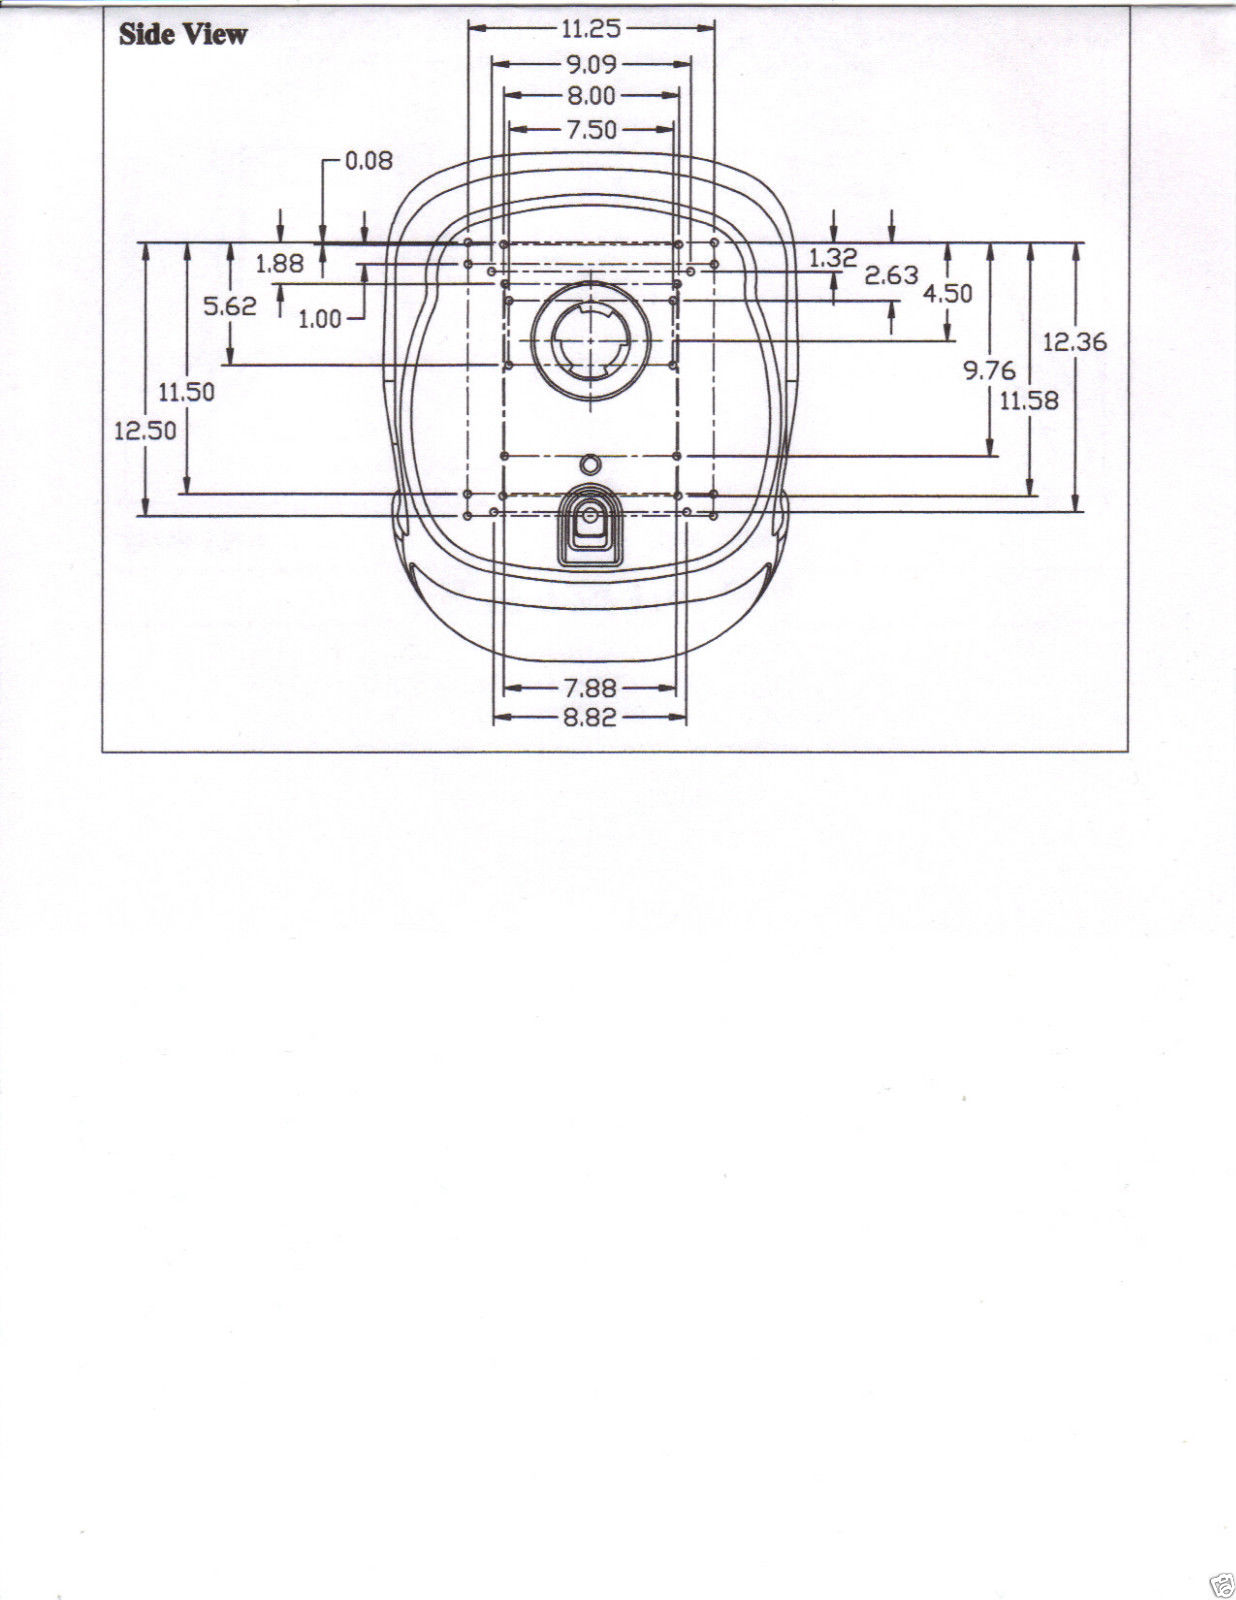 GRAY SEAT HUSTLER JACOBSEN TORO DIXIE CHOPPER ZERO TURN FRONT – Dixie Chopper Electrical Wiring Diagram